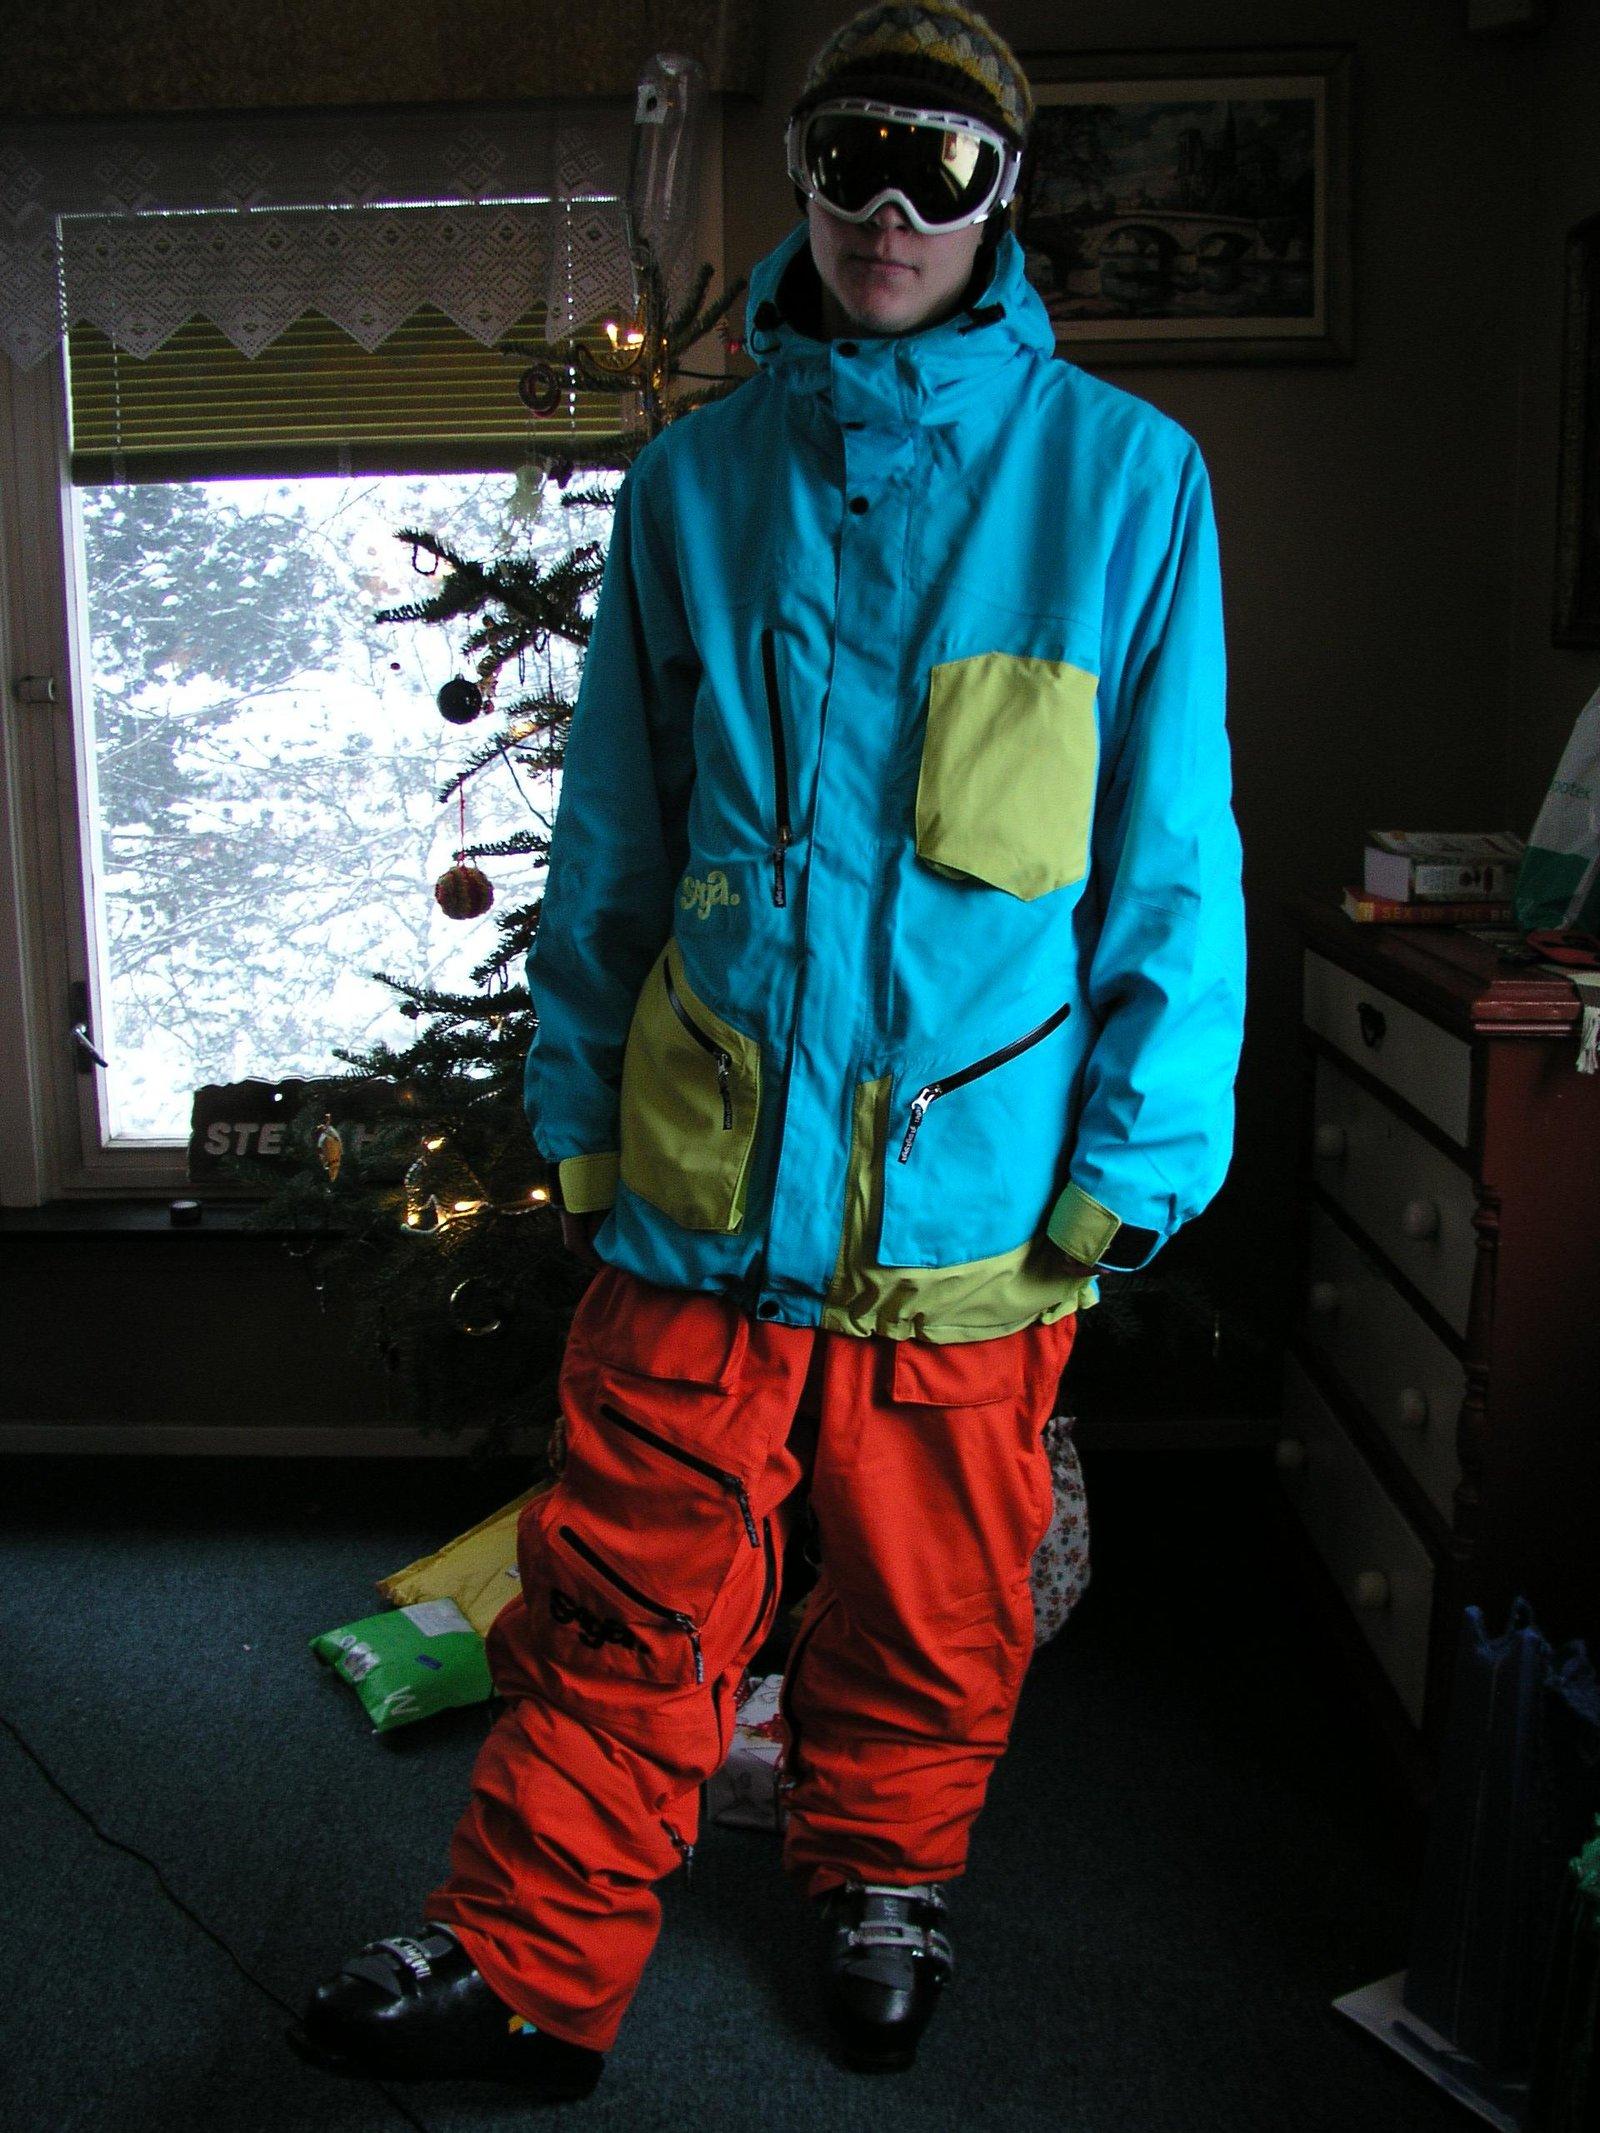 My saga suit